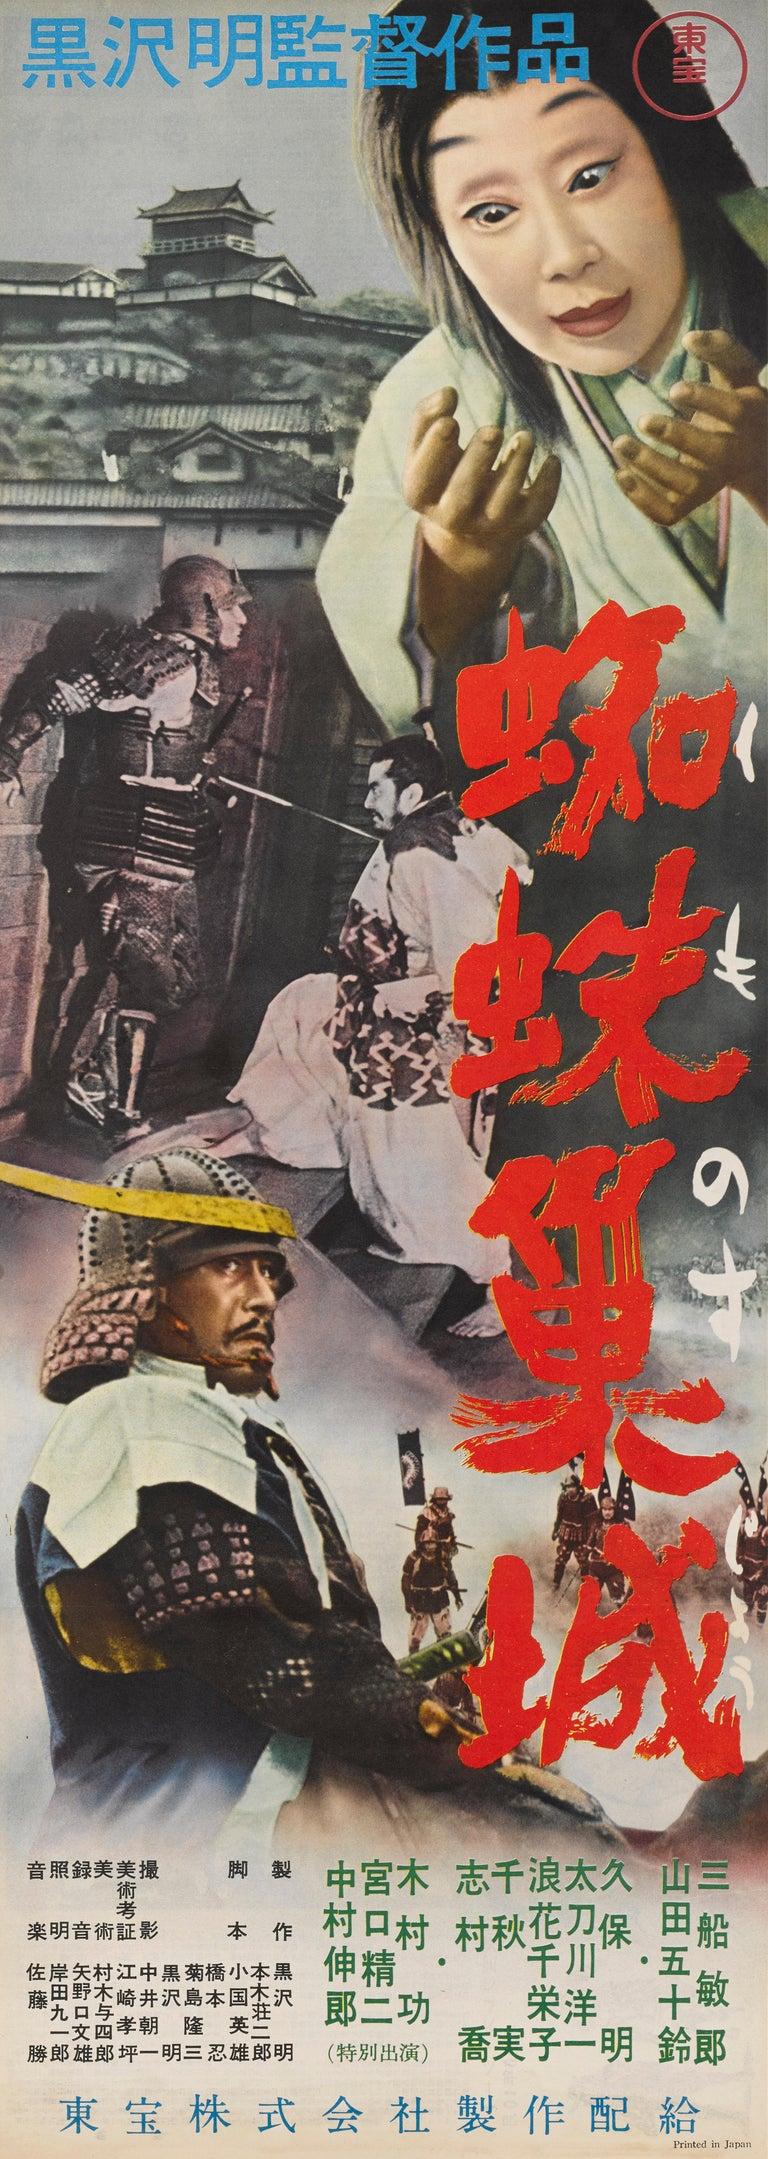 Japanese Kumonoso/Throne of Blood For Sale